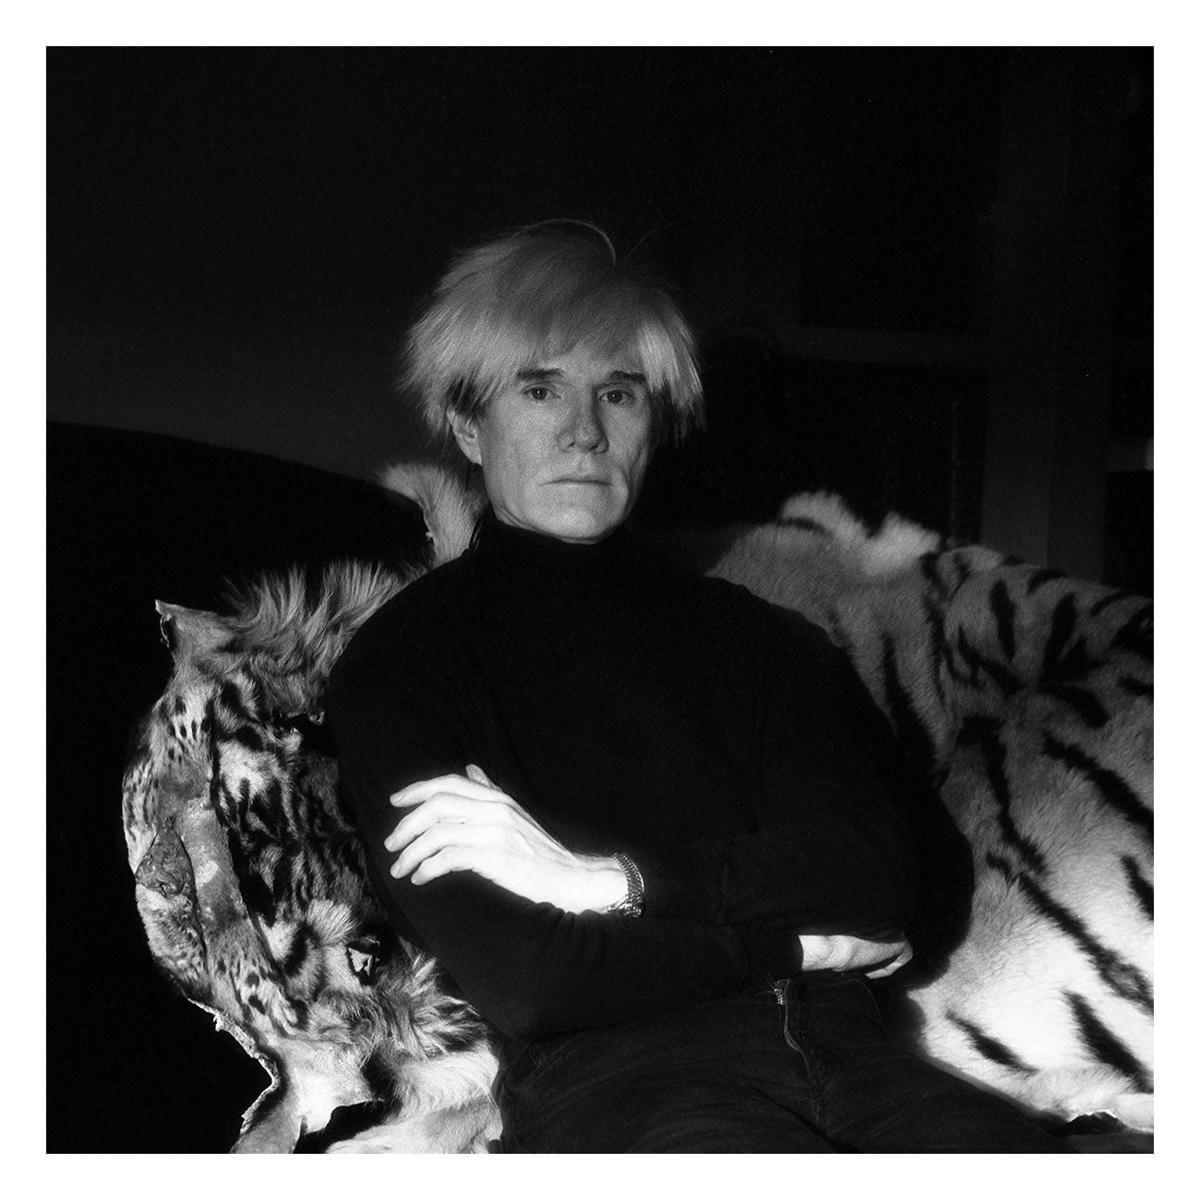 Vintage Framed Photograph of Andy Warhol